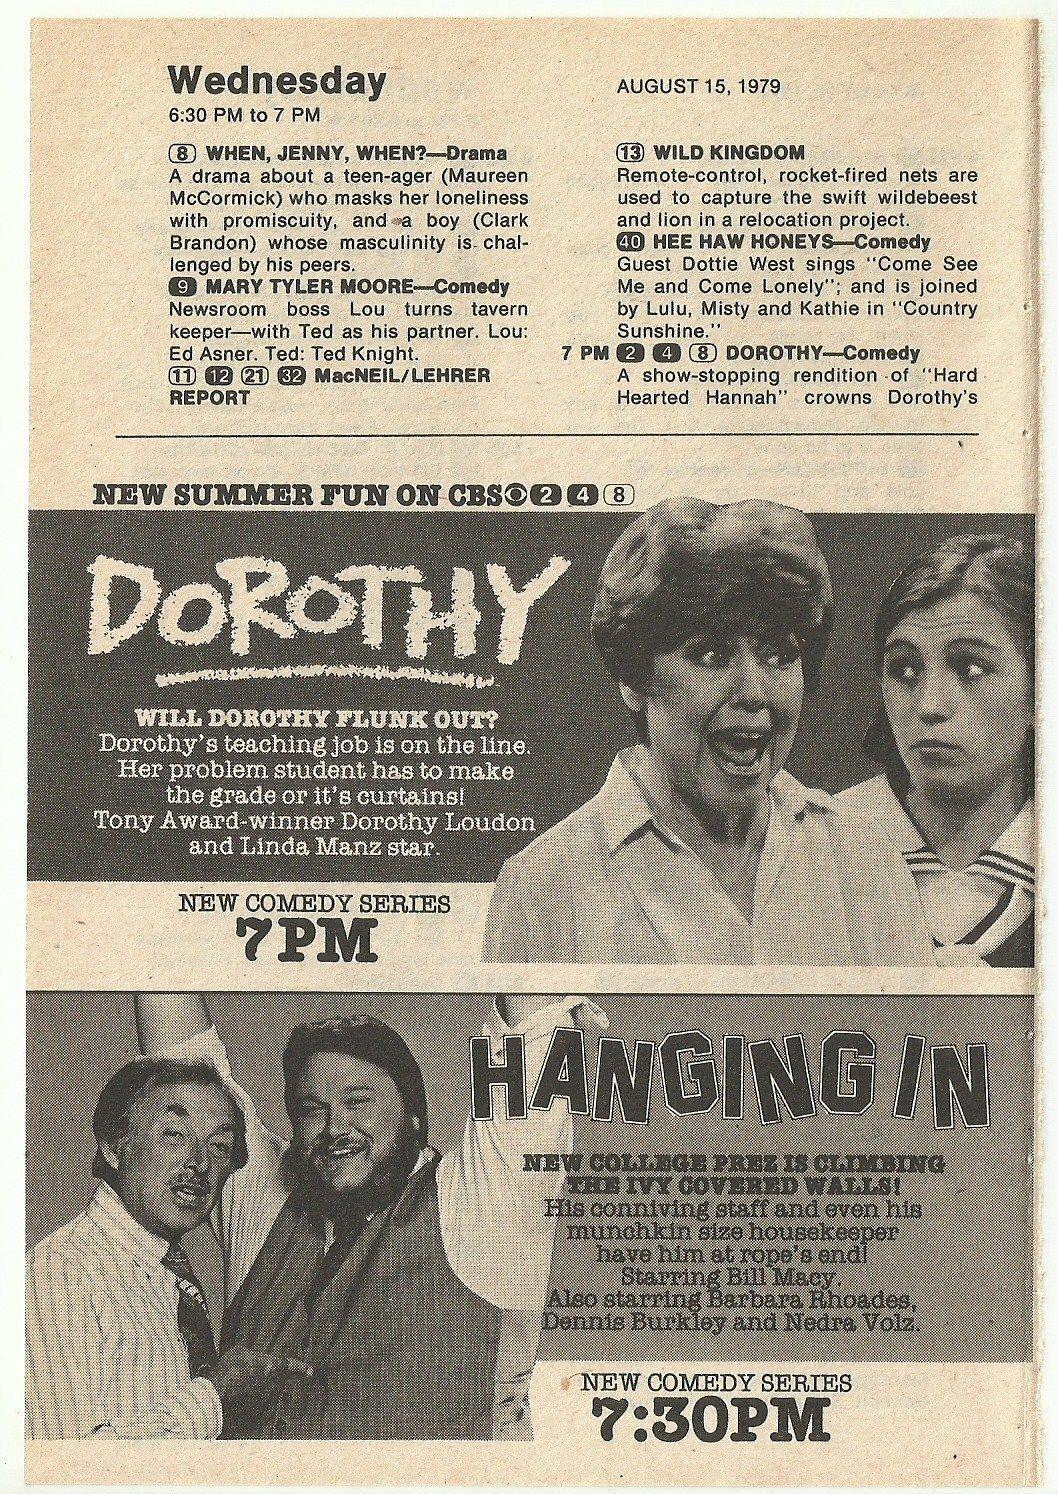 HANGING_IN_1979_Magazine_Ad_DENNIS_BURKLEY_Bill_Macy_DOROTHY_LOUDON_Linda_Manz